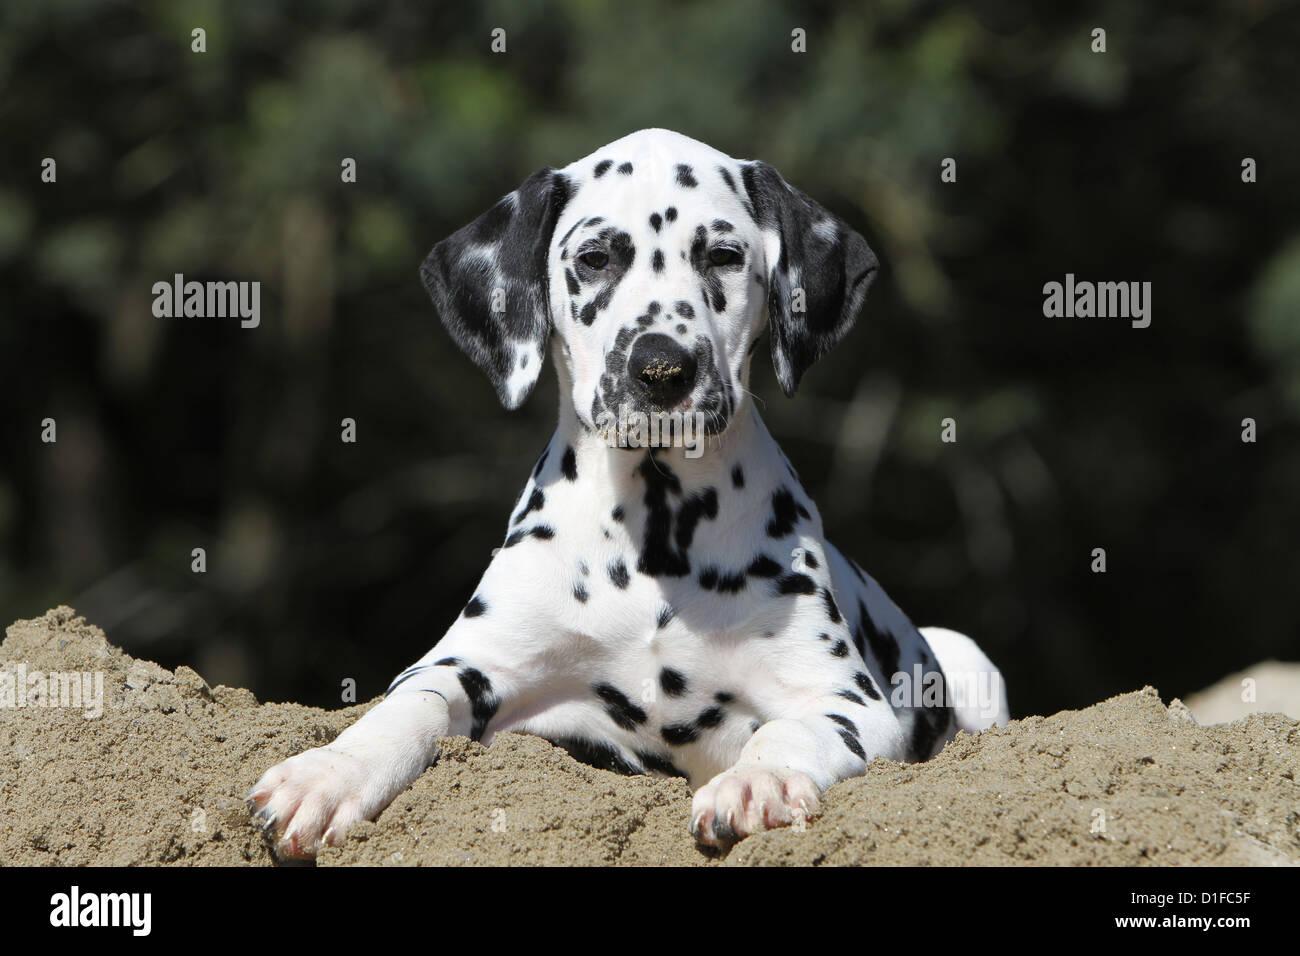 Dog Dalmatian / Dalmatiner / Dalmatien puppy lying on the ground - Stock Image